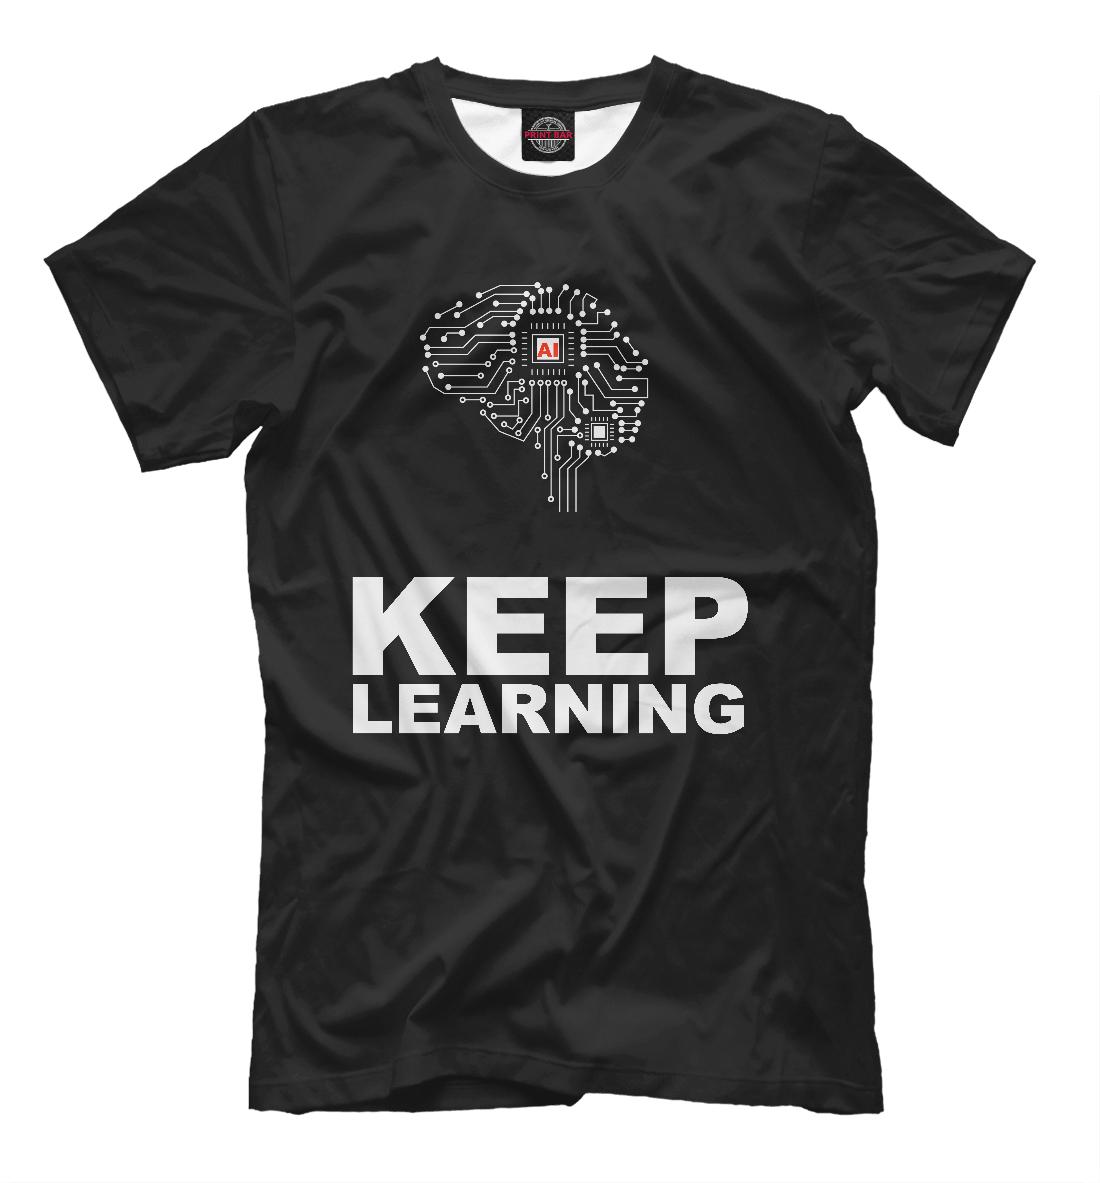 Фото - AI – Keep learning ai weiwei laundromat